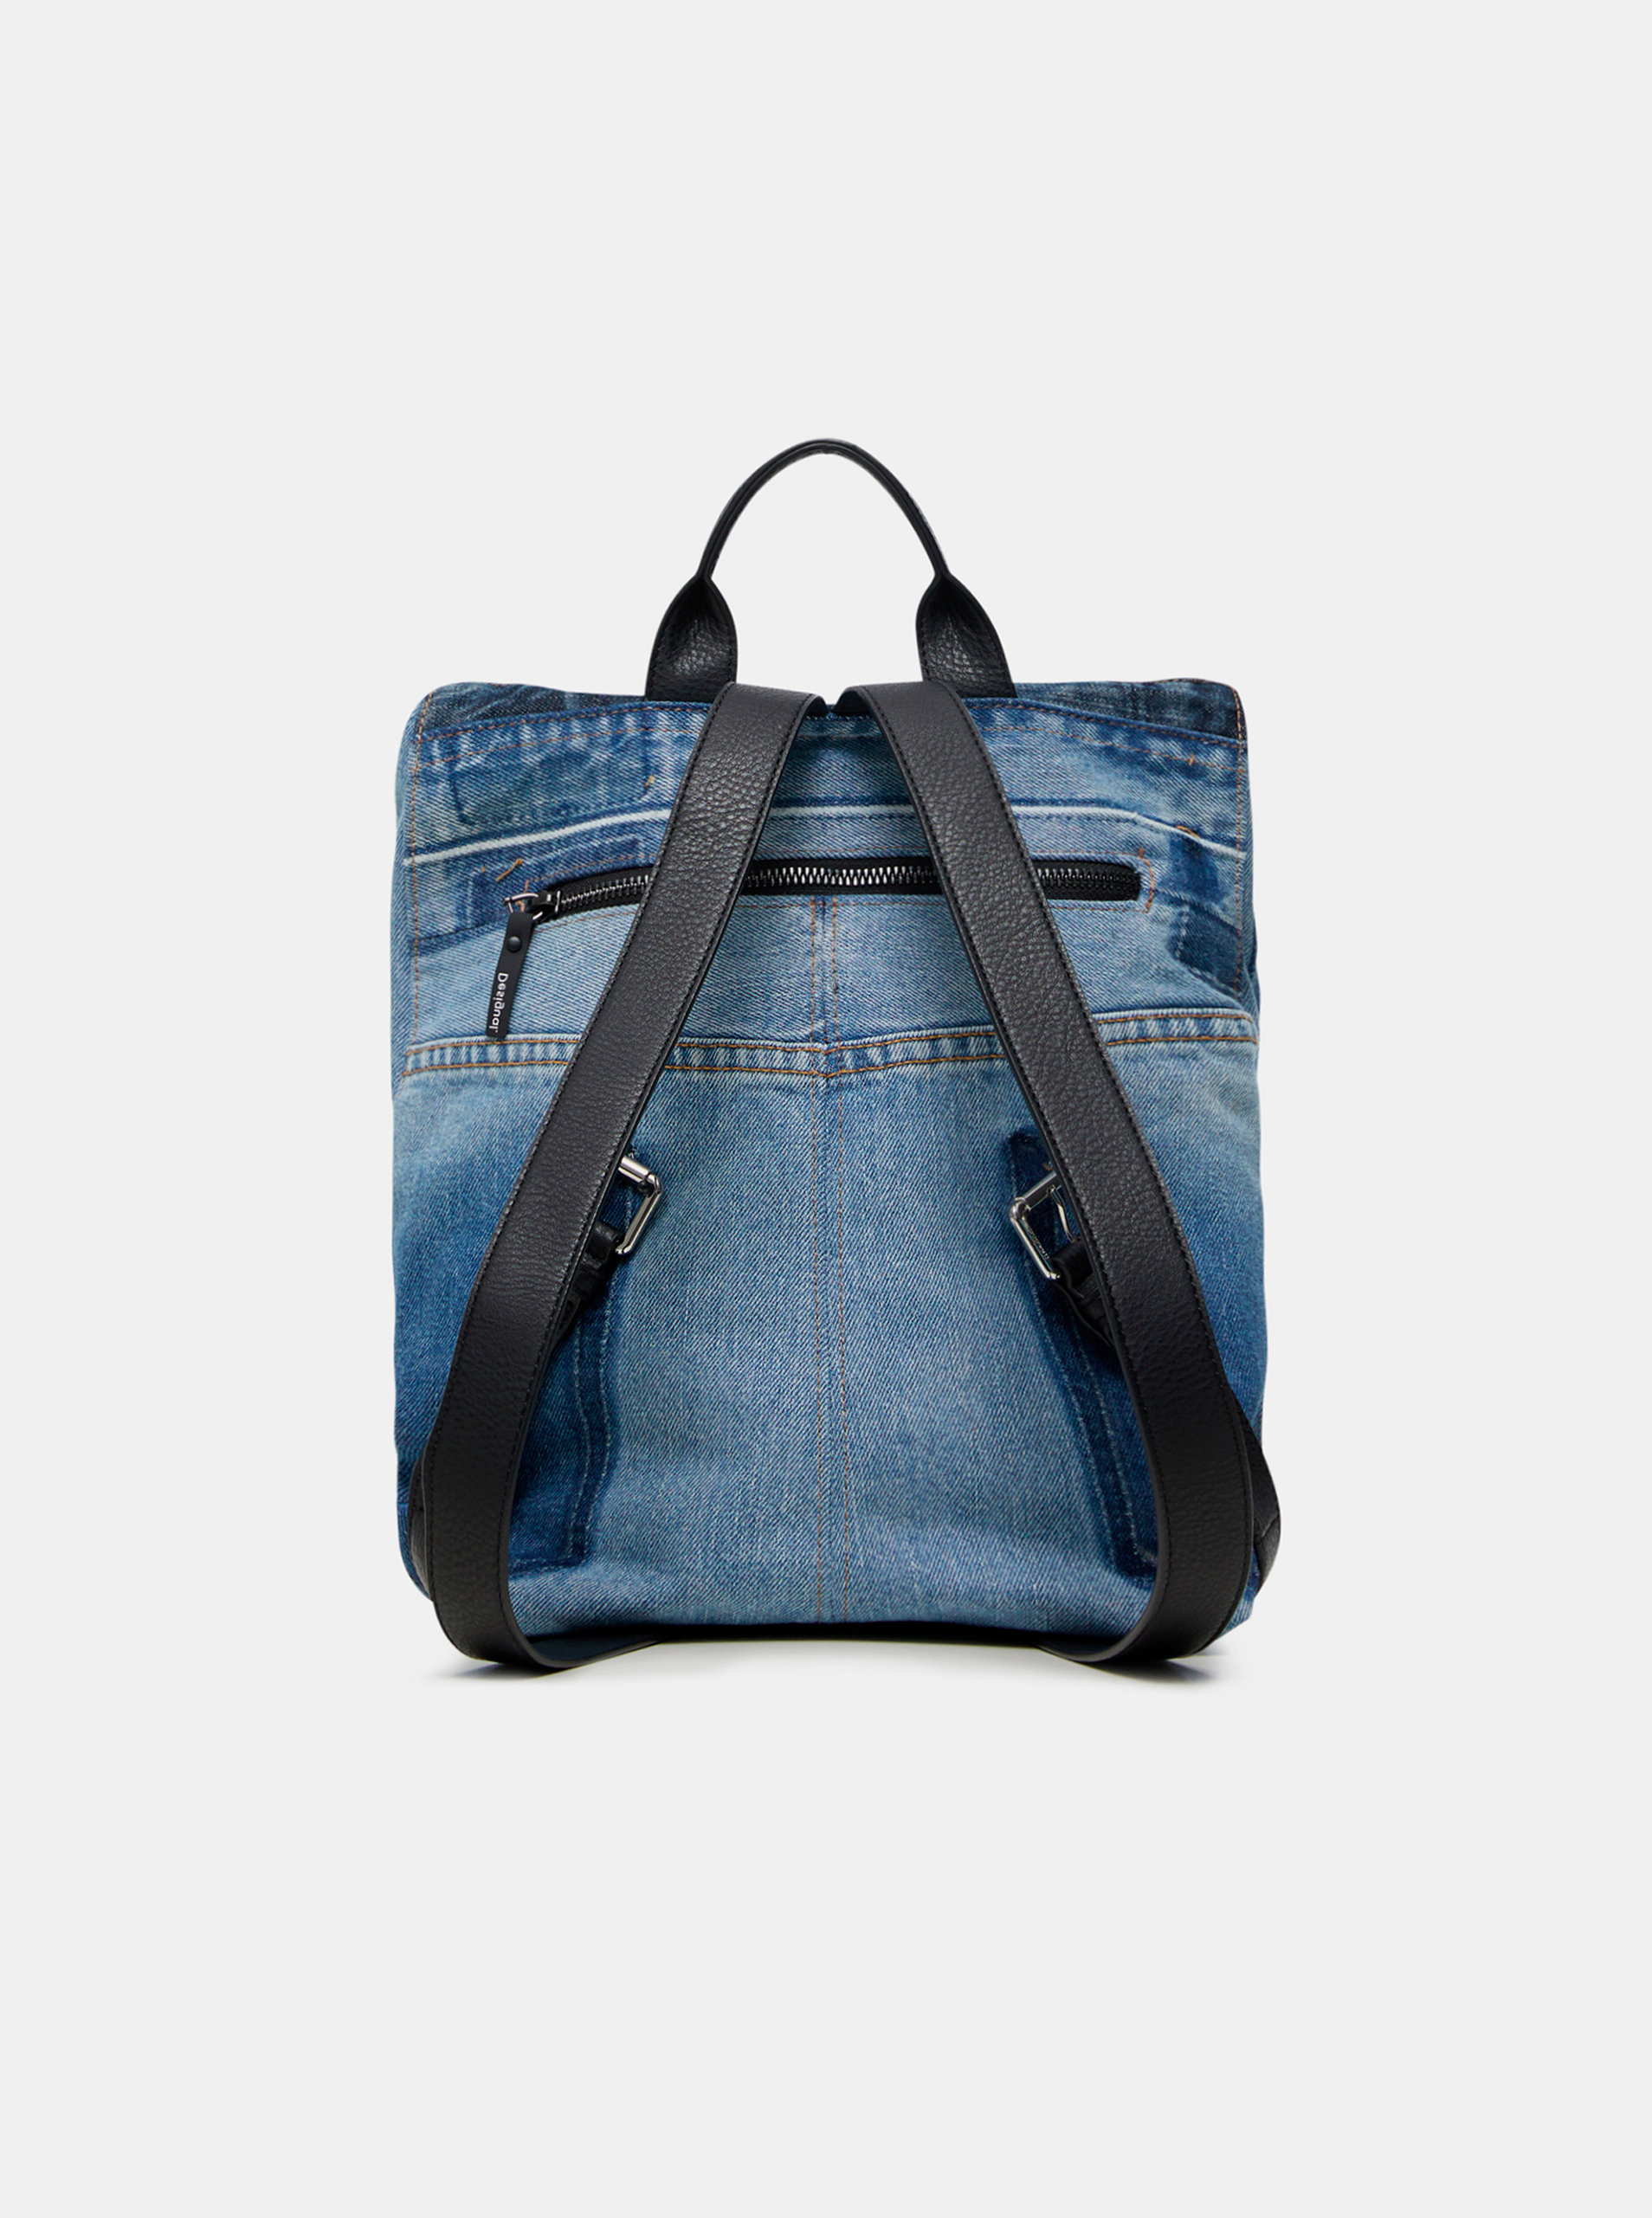 Desigual Plecak damski niebieski  Denim